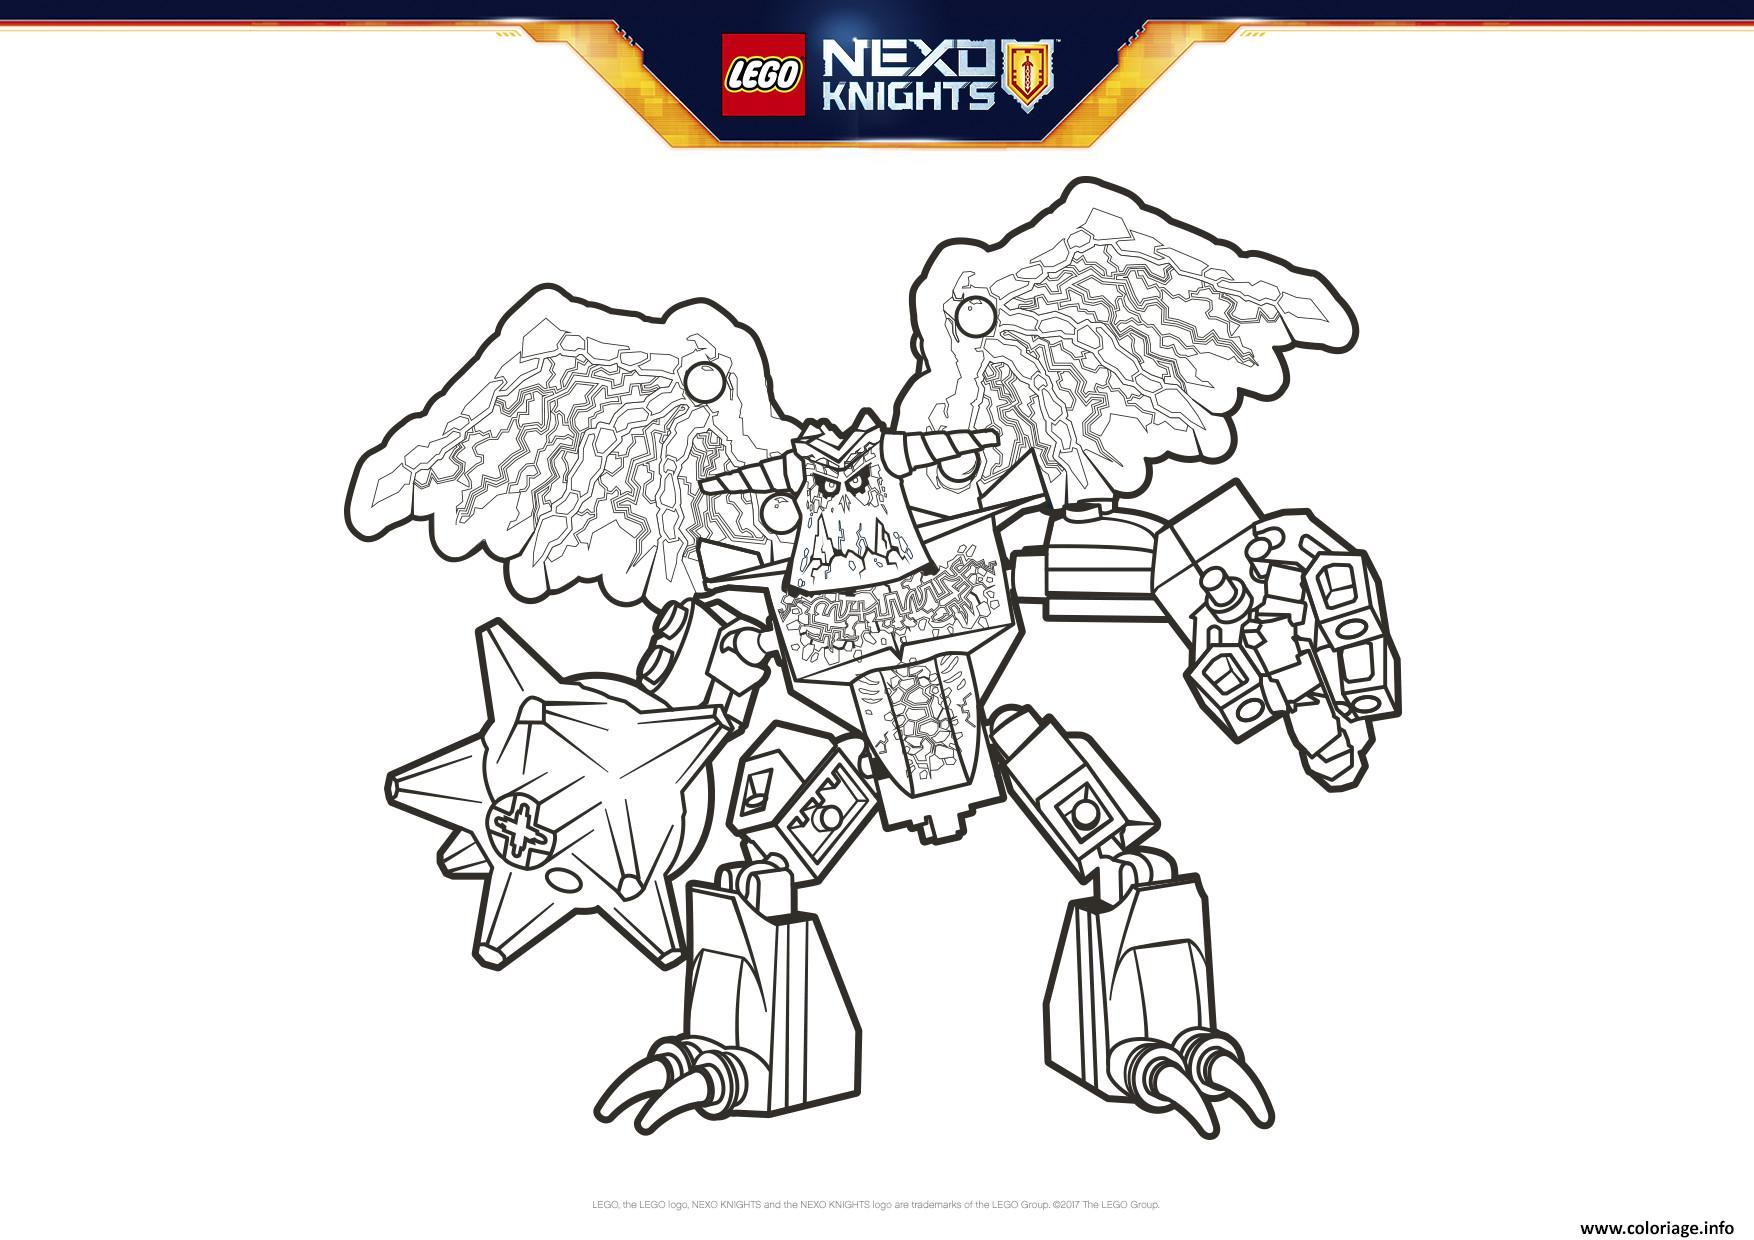 Coloriage lego nexo knights grimroc dessin - Dessin de ninjago a imprimer ...